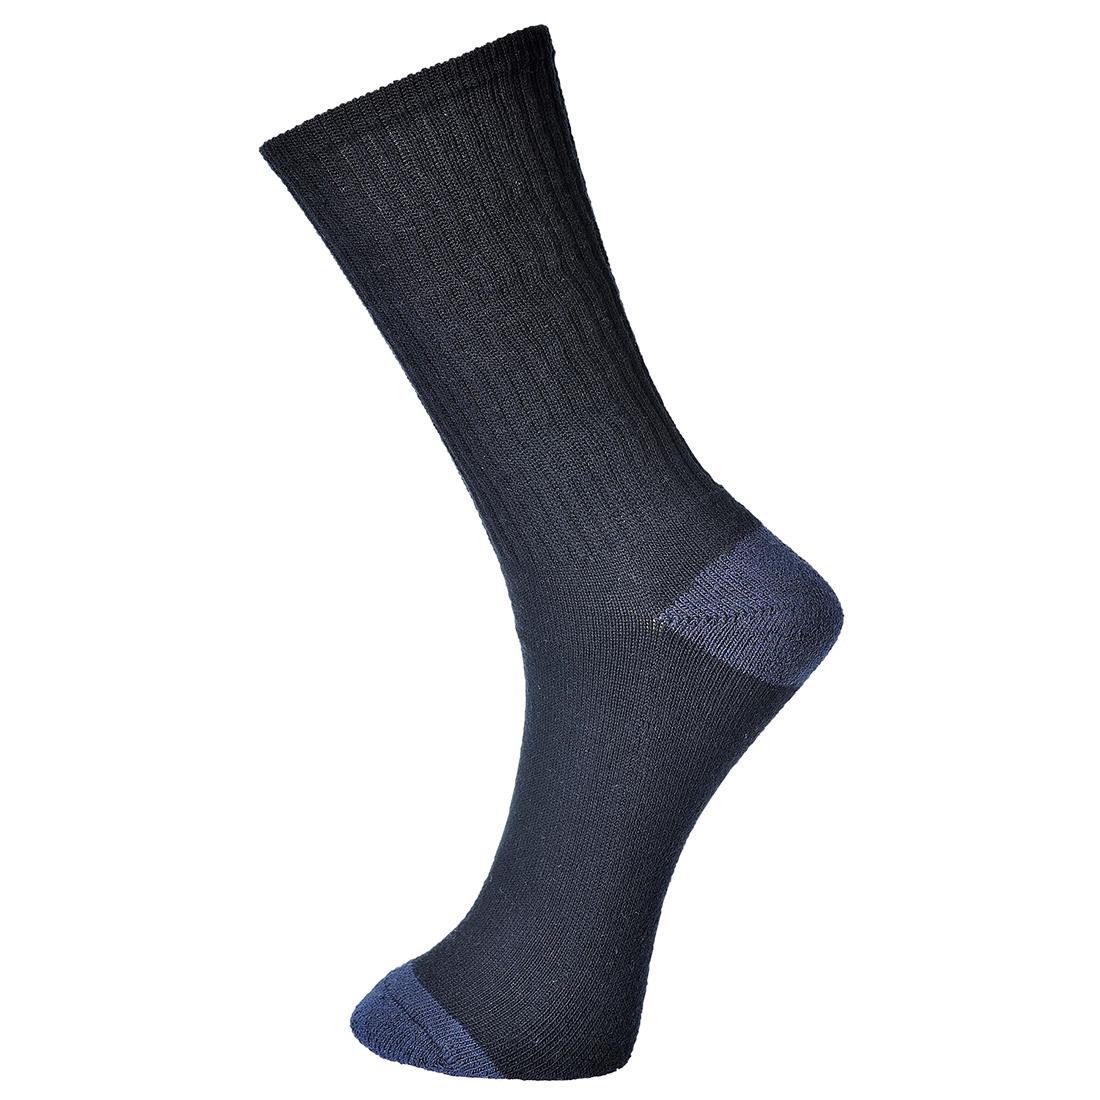 Classic Cotton Sock Black 44-48R